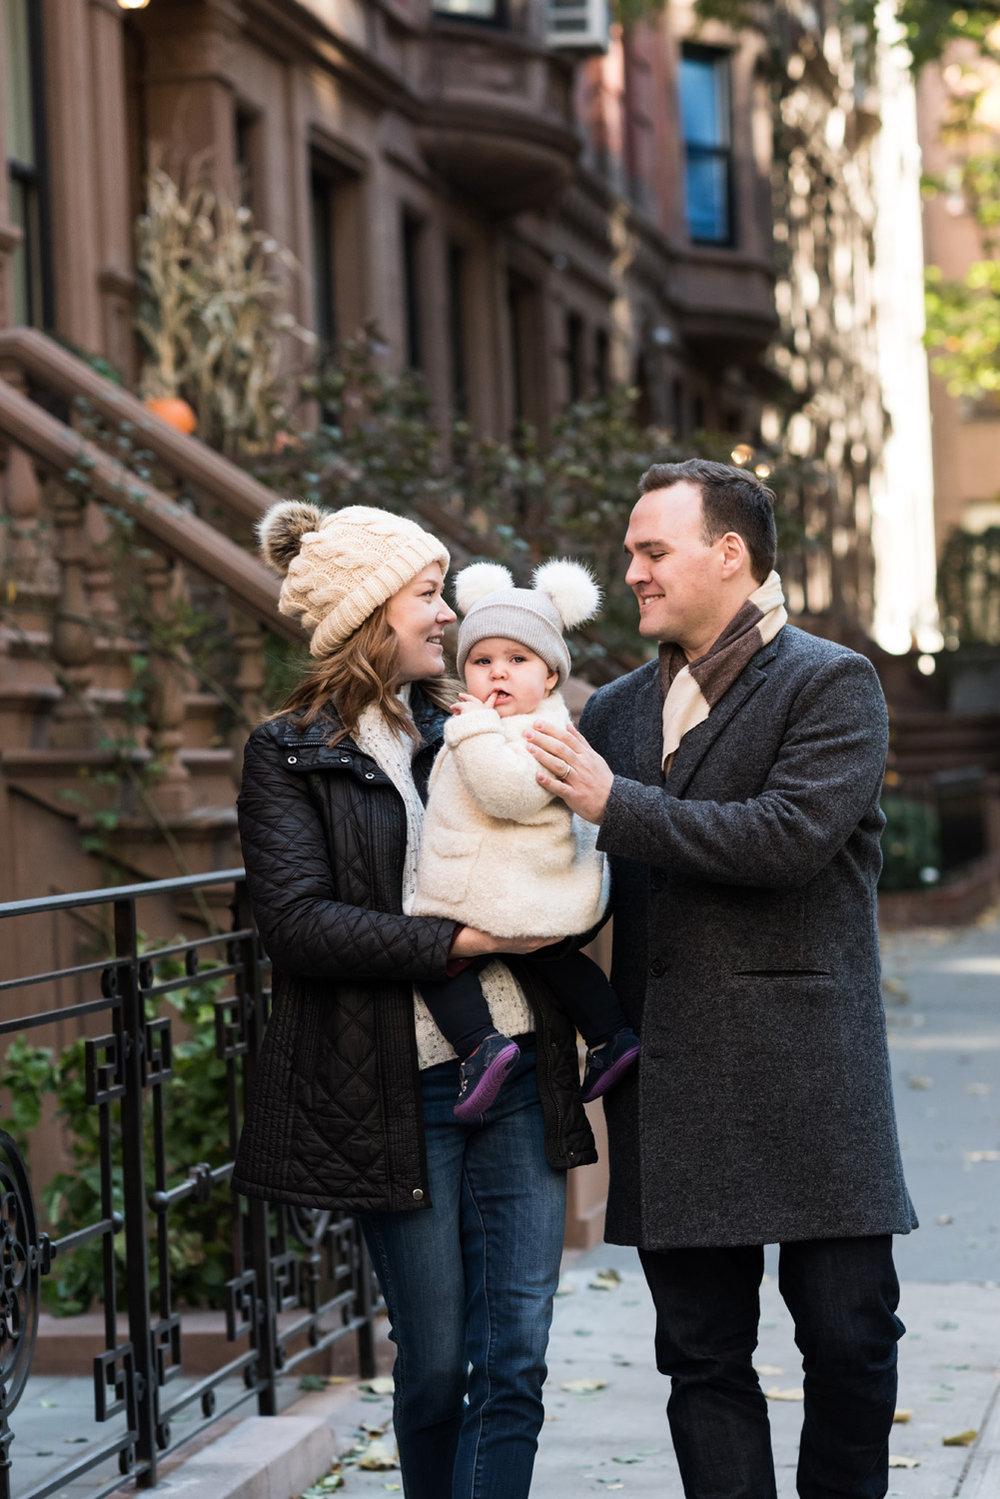 nyc family photographer-11112017_46.jpg